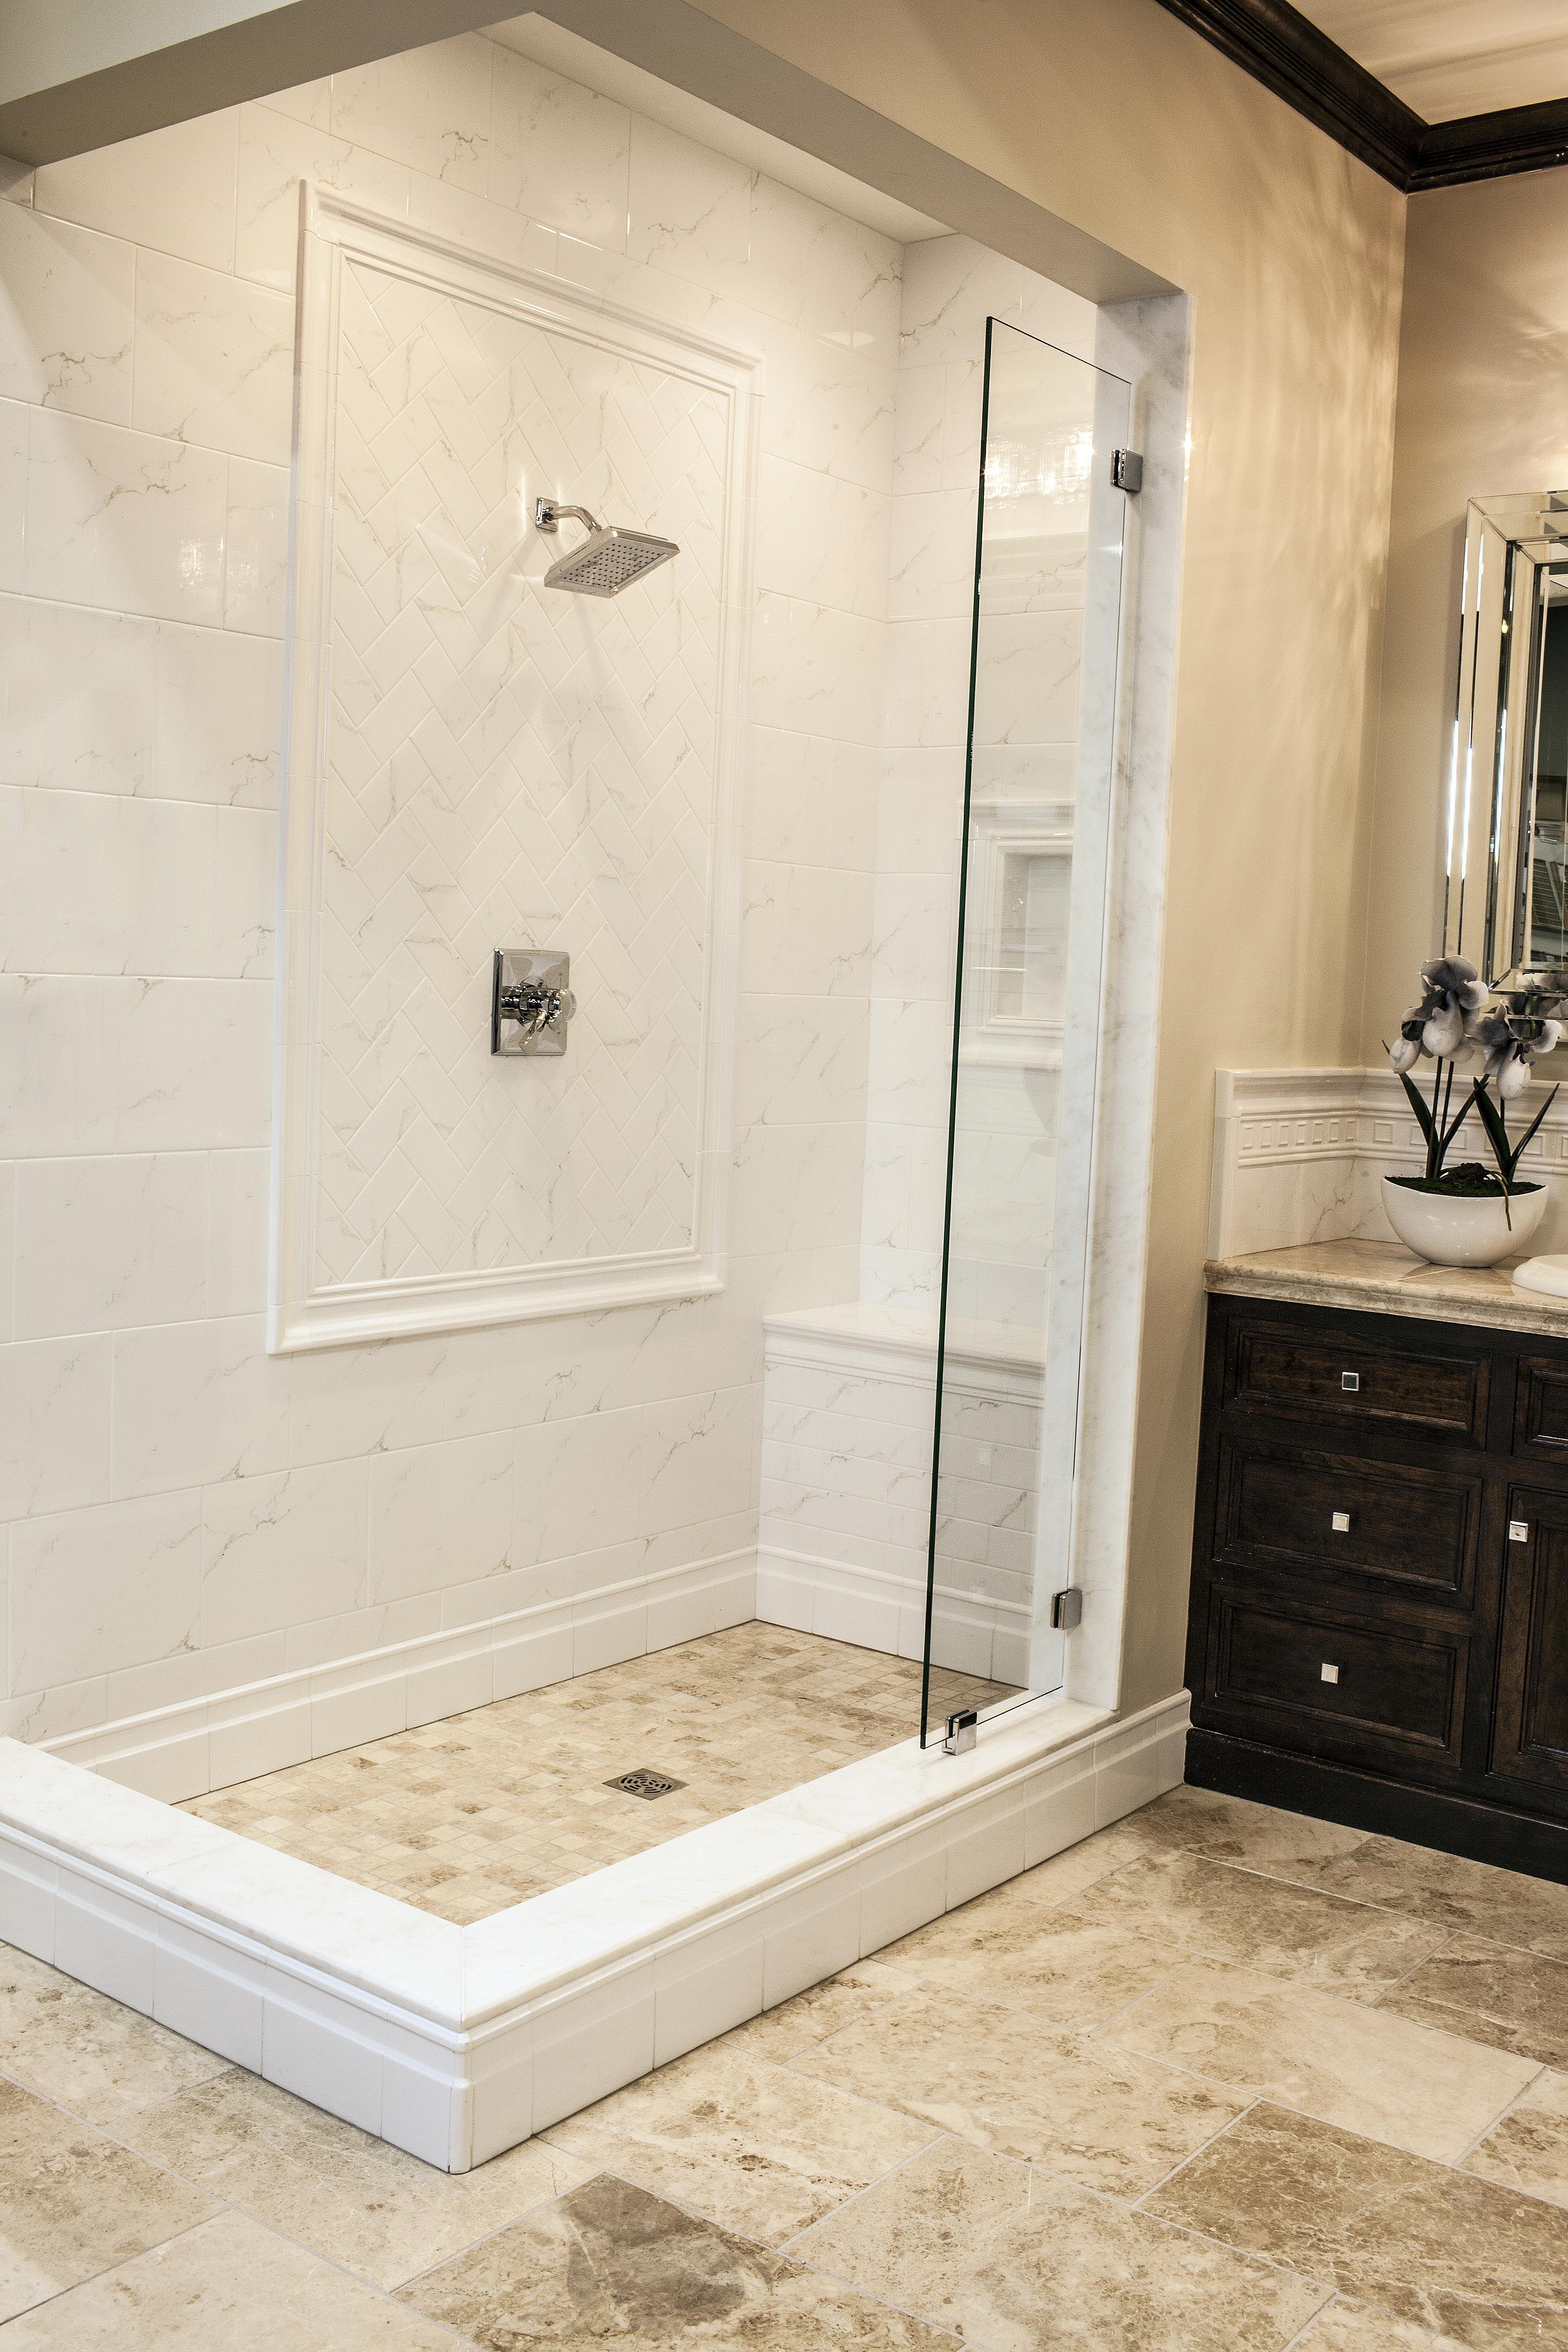 Walk-in ceramic tile shower - interesting idea to put… | Bathroom ...